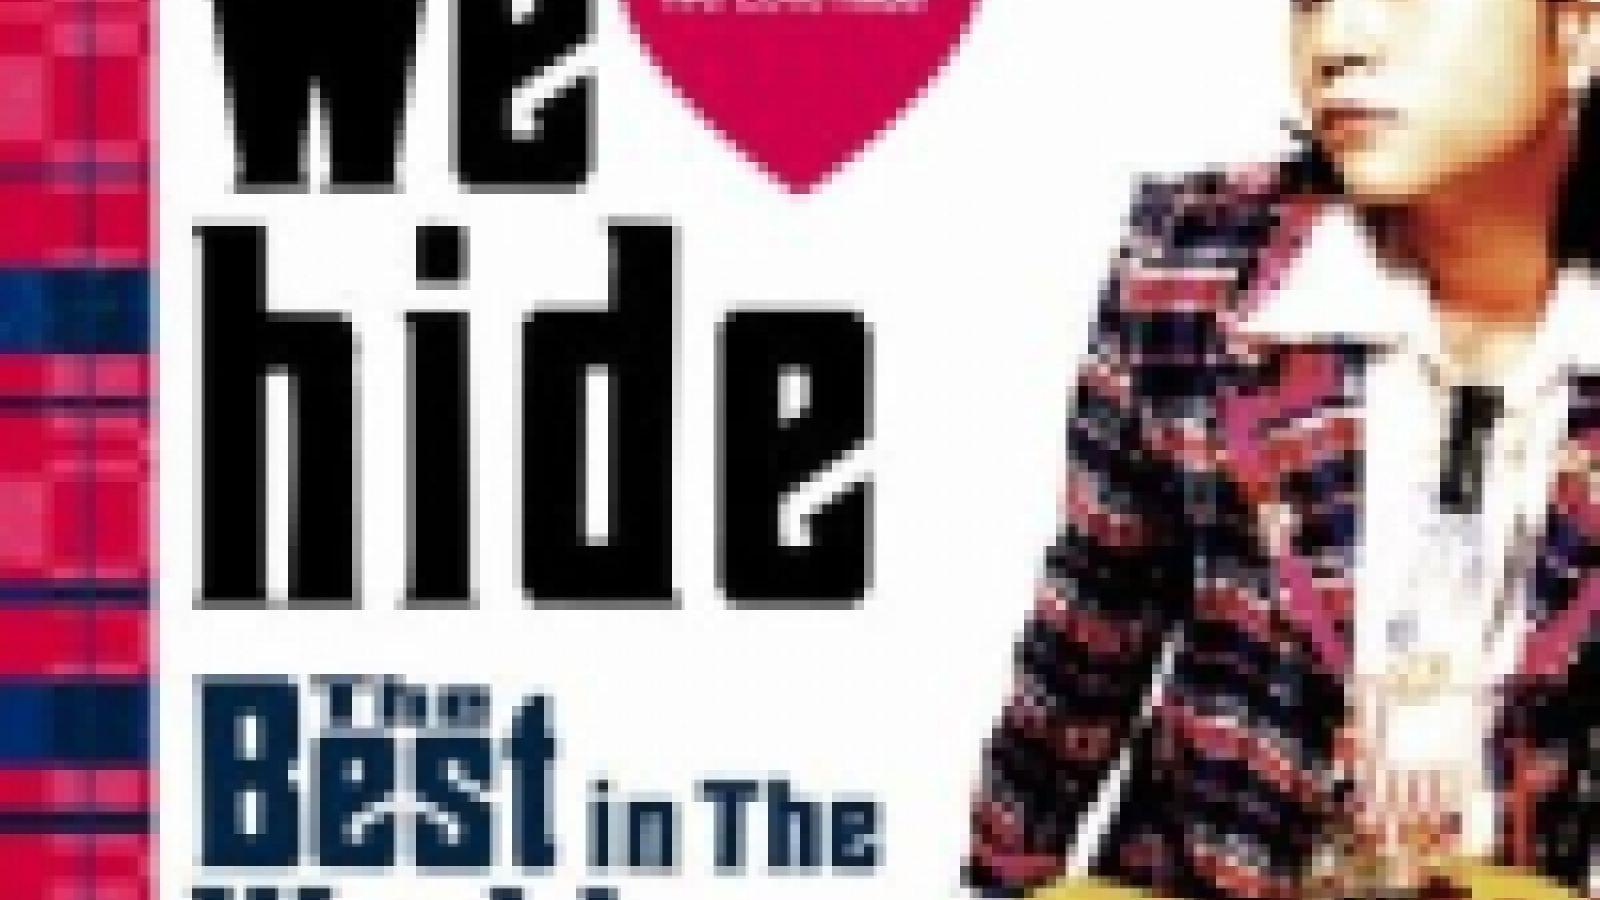 Details on hide's best-of album © JaME